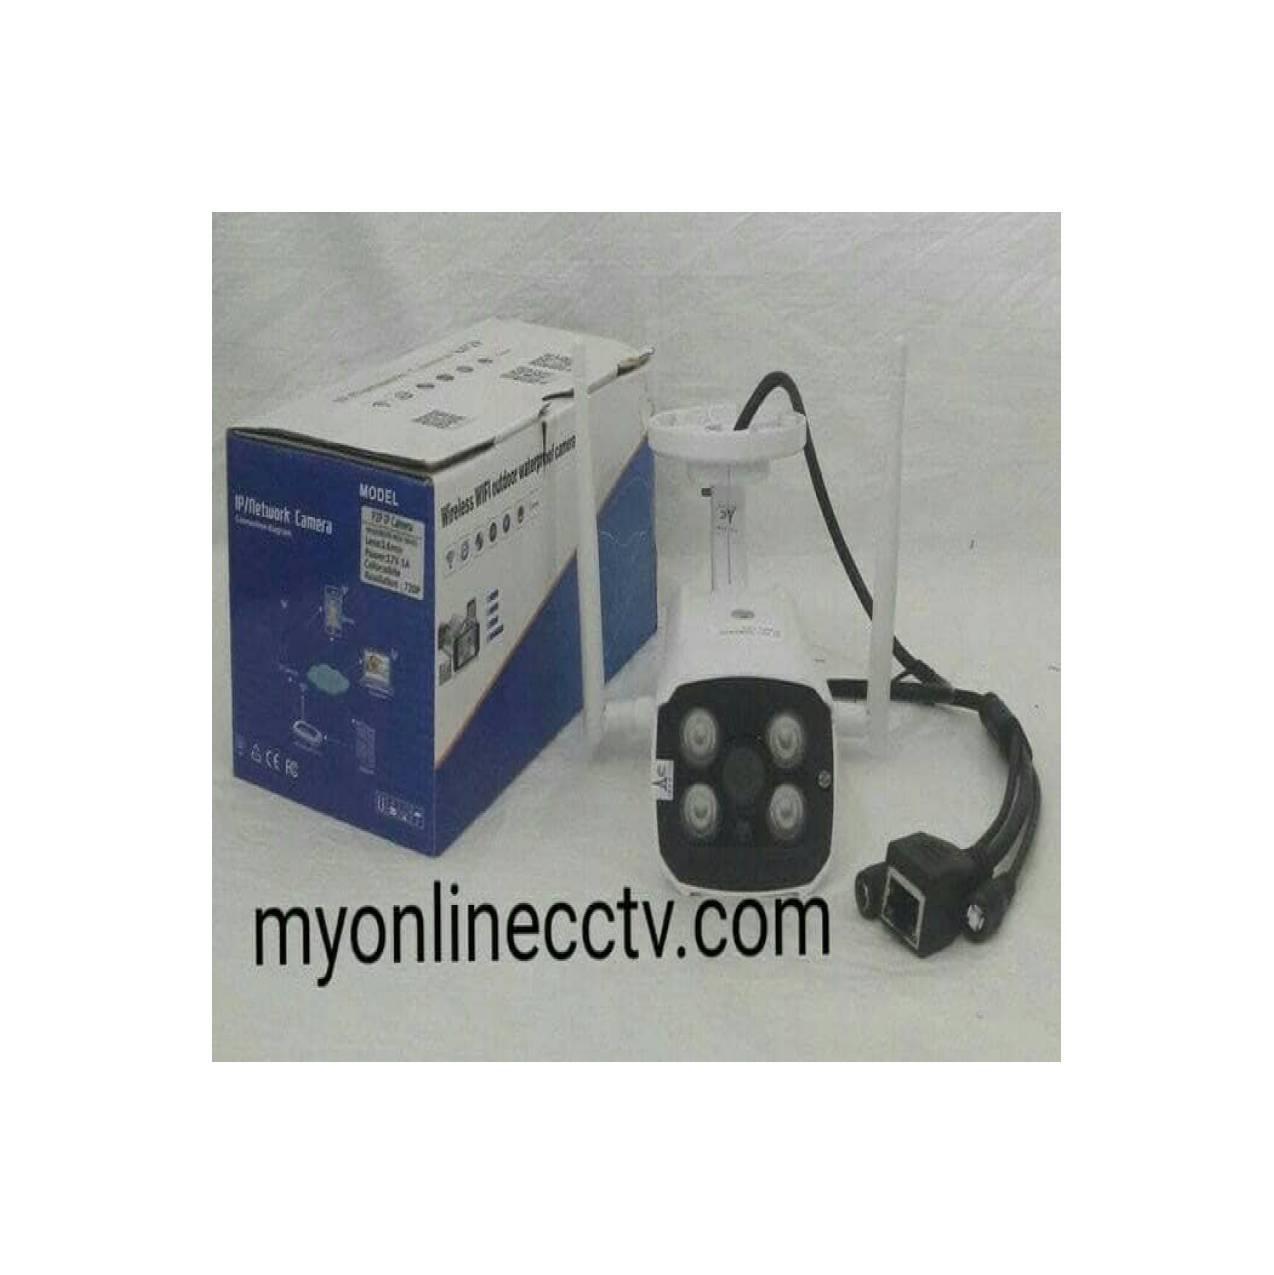 Beli Cctv Mmc Store Marwanto606 Xiaomi Xiaoyi Yi Dome 1080 1080p Full Hd International 16gb Ip Camera Outdoor Wireless Praktis Wifi Tahan Air